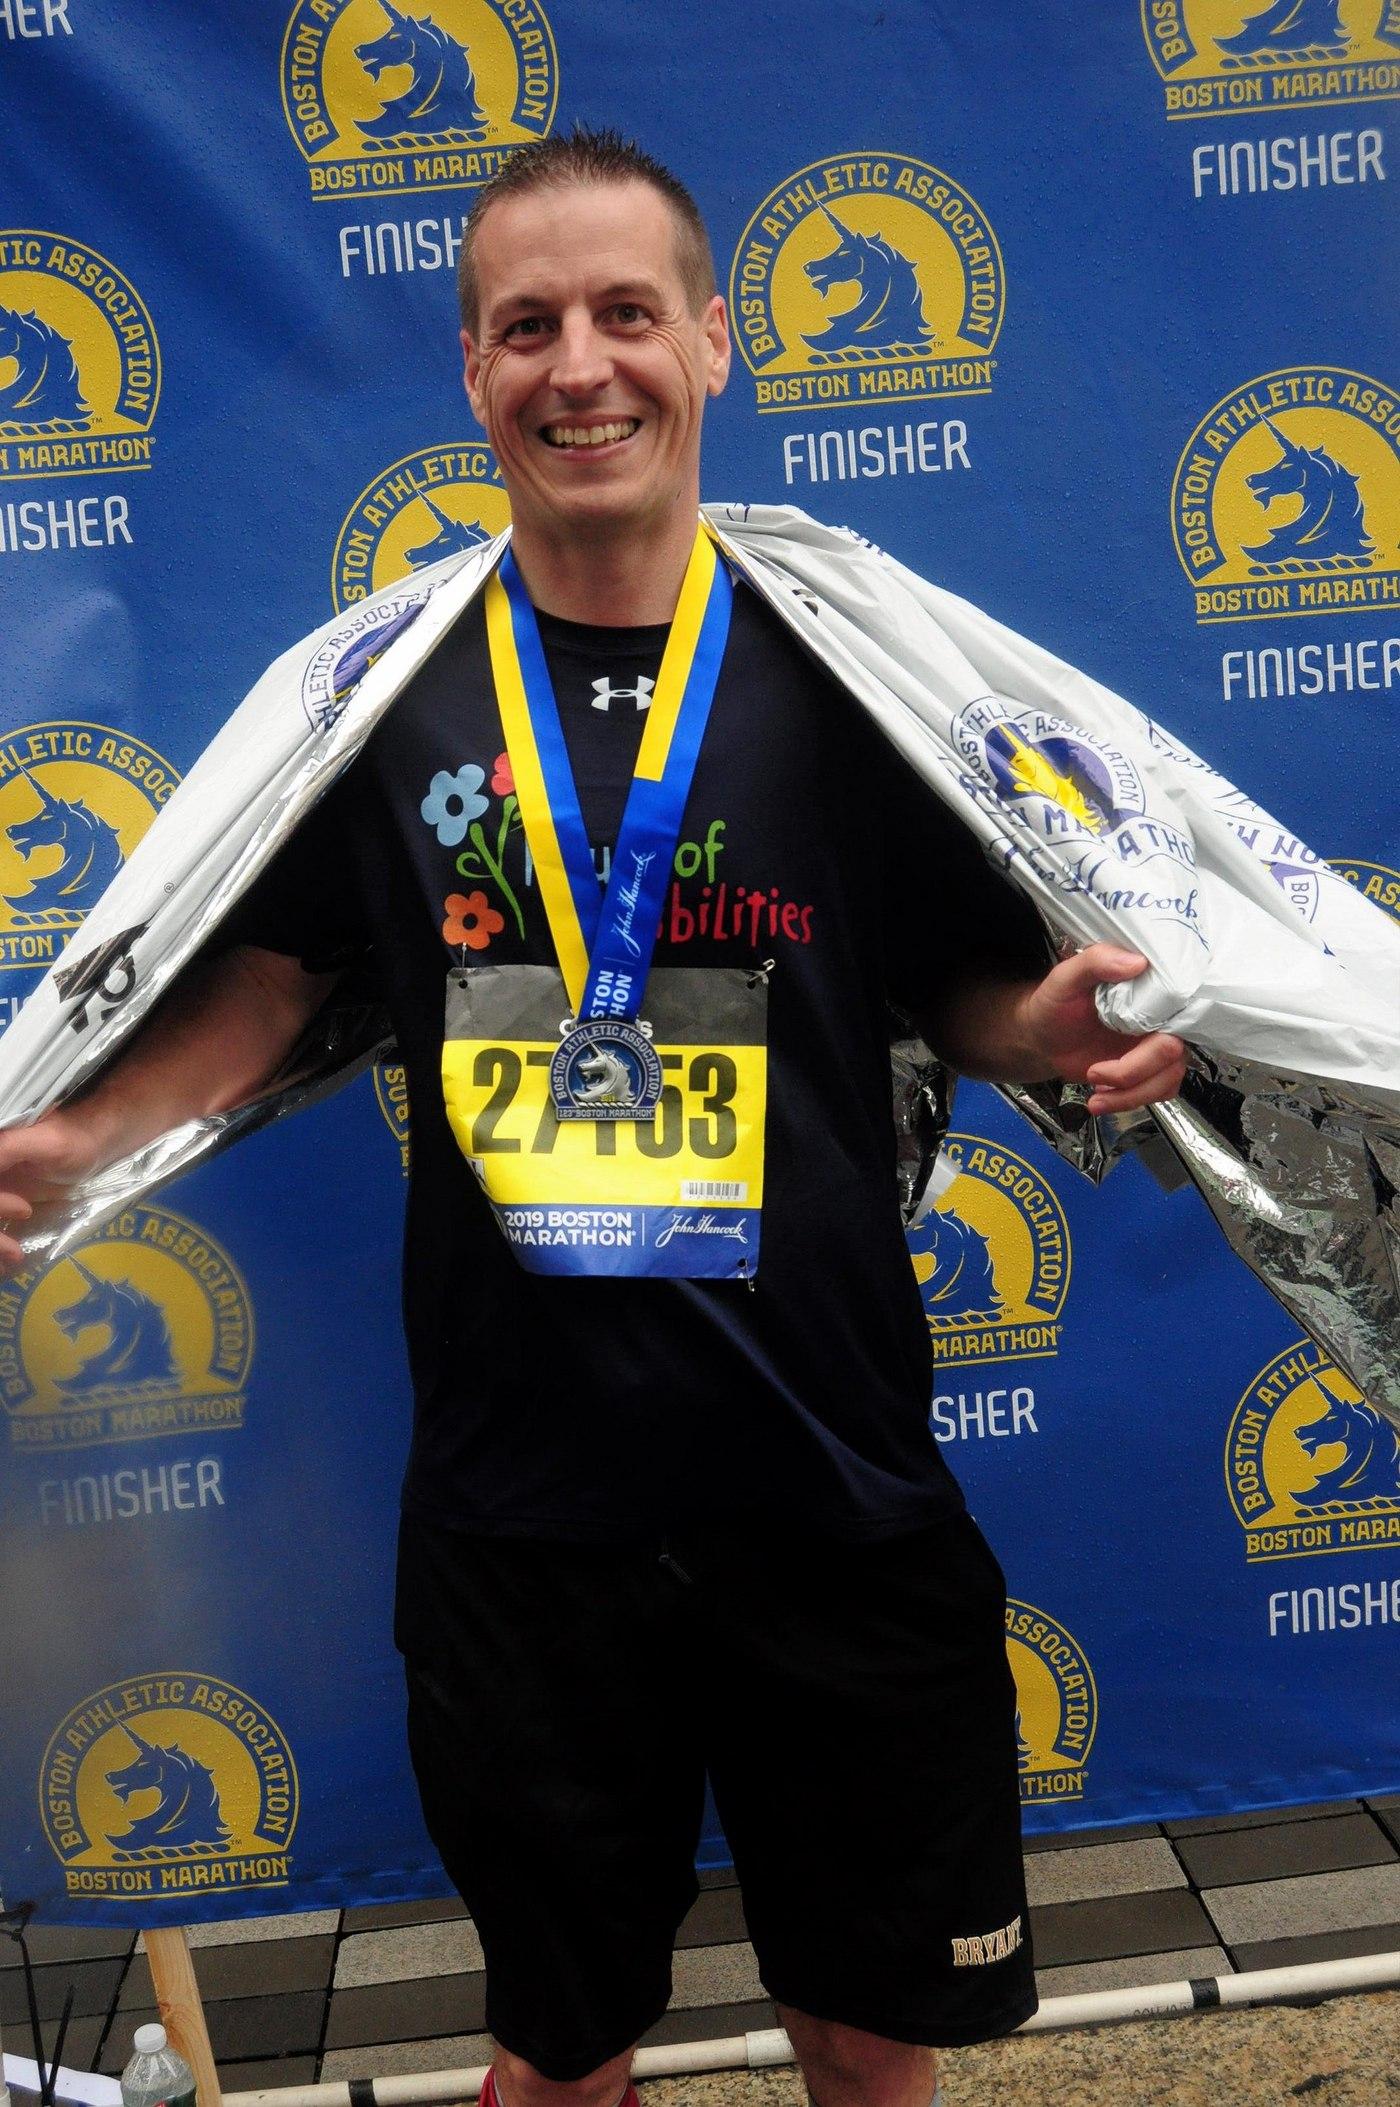 Chris-Pintarich-Berry-Insurance-Boston-Marathon